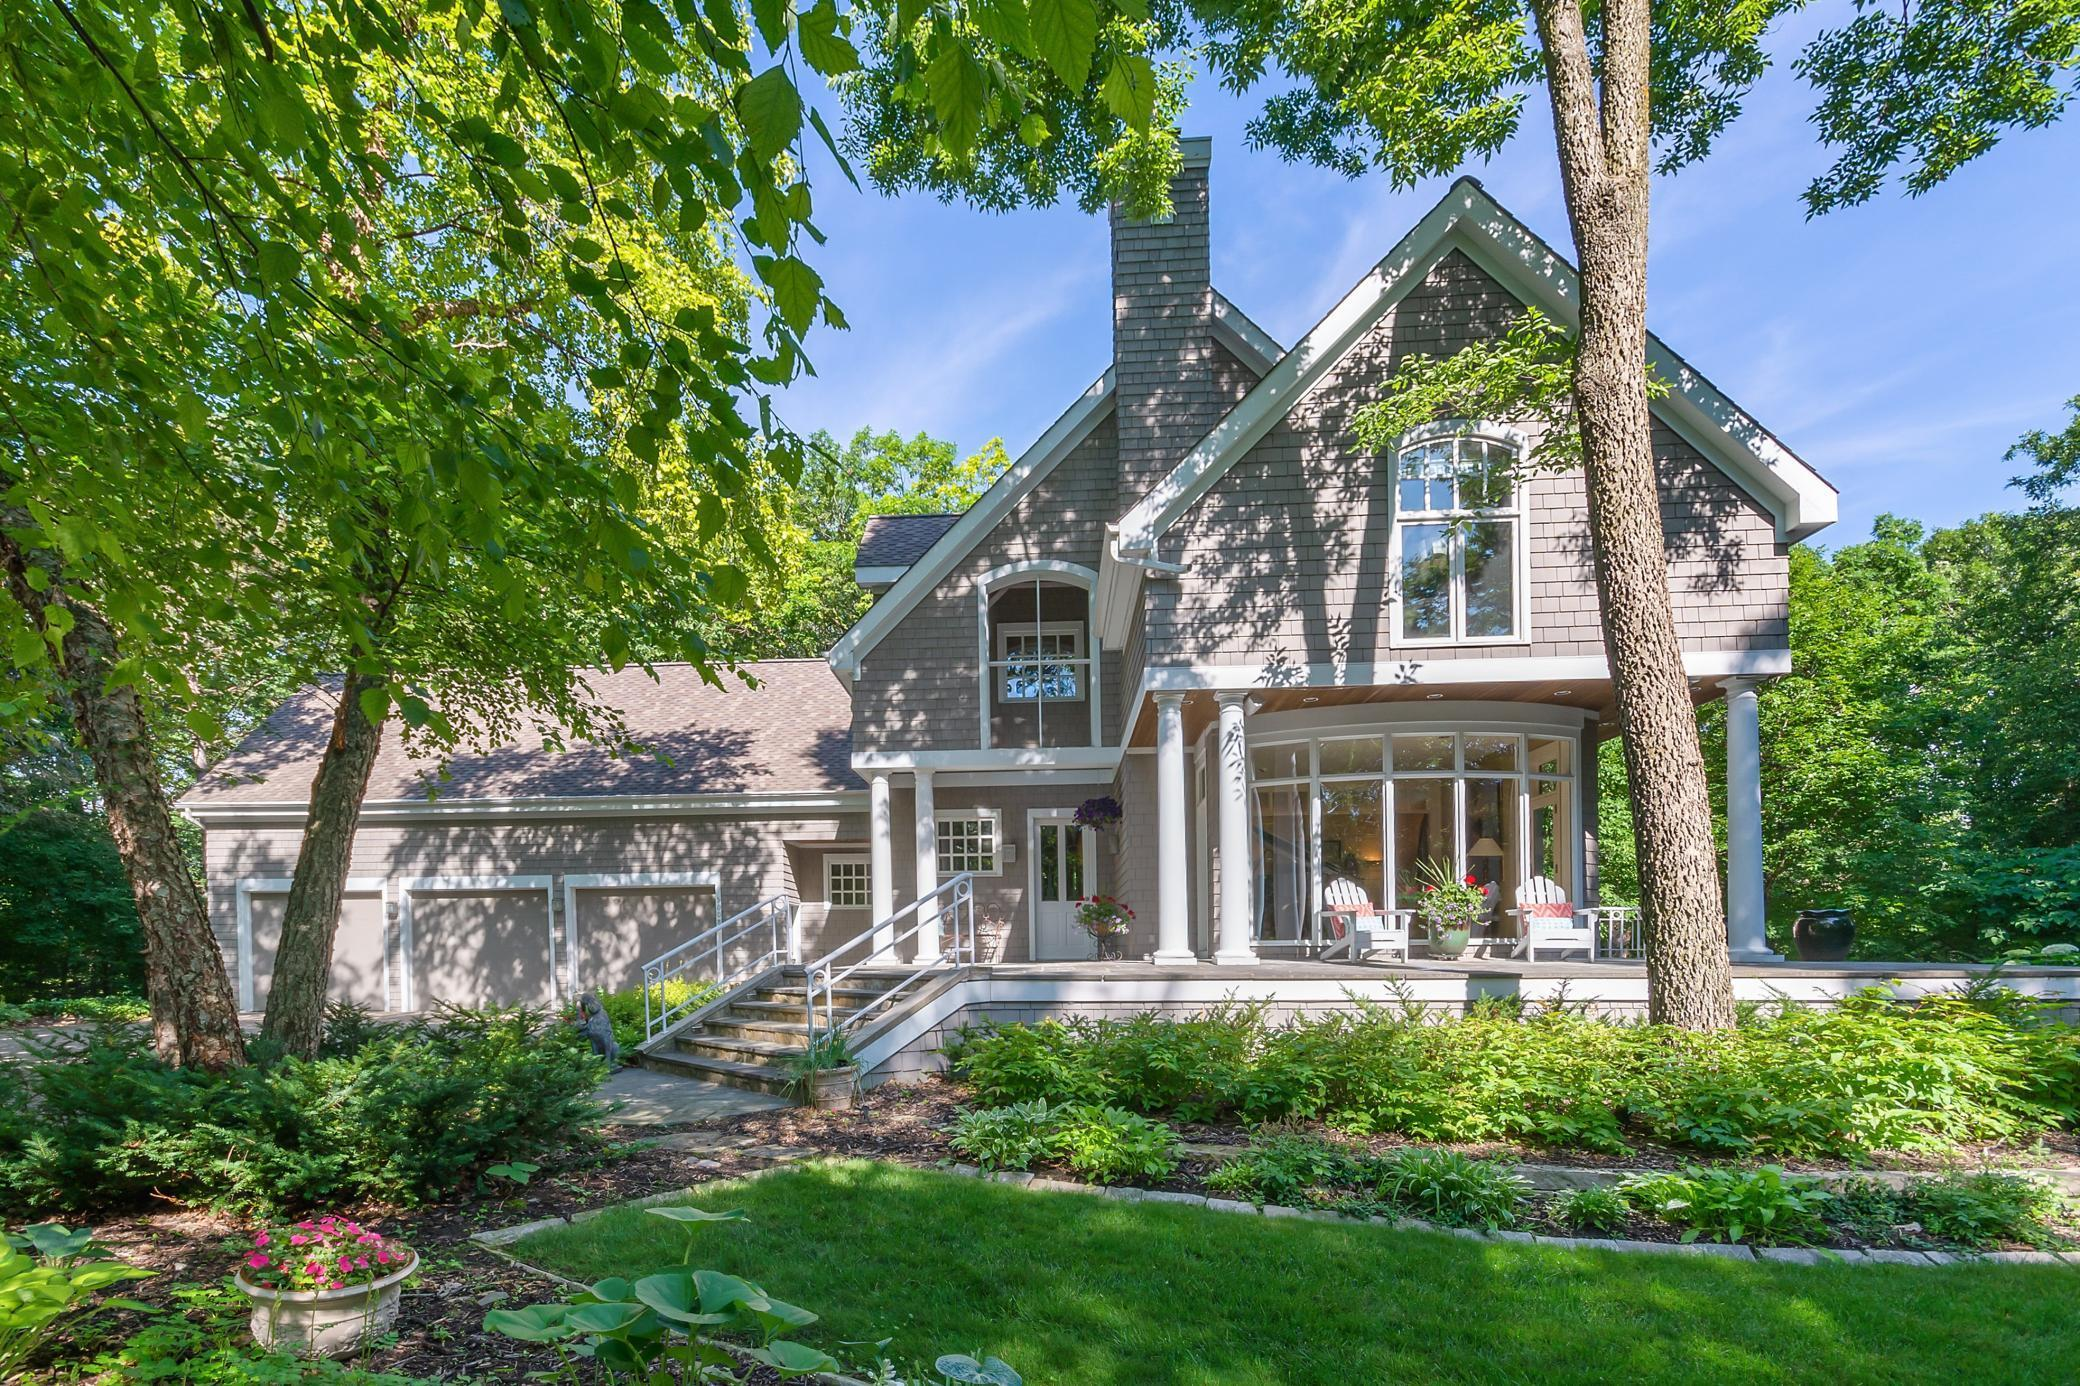 5008 Woodhurst Lane Property Photo - Minnetonka, MN real estate listing